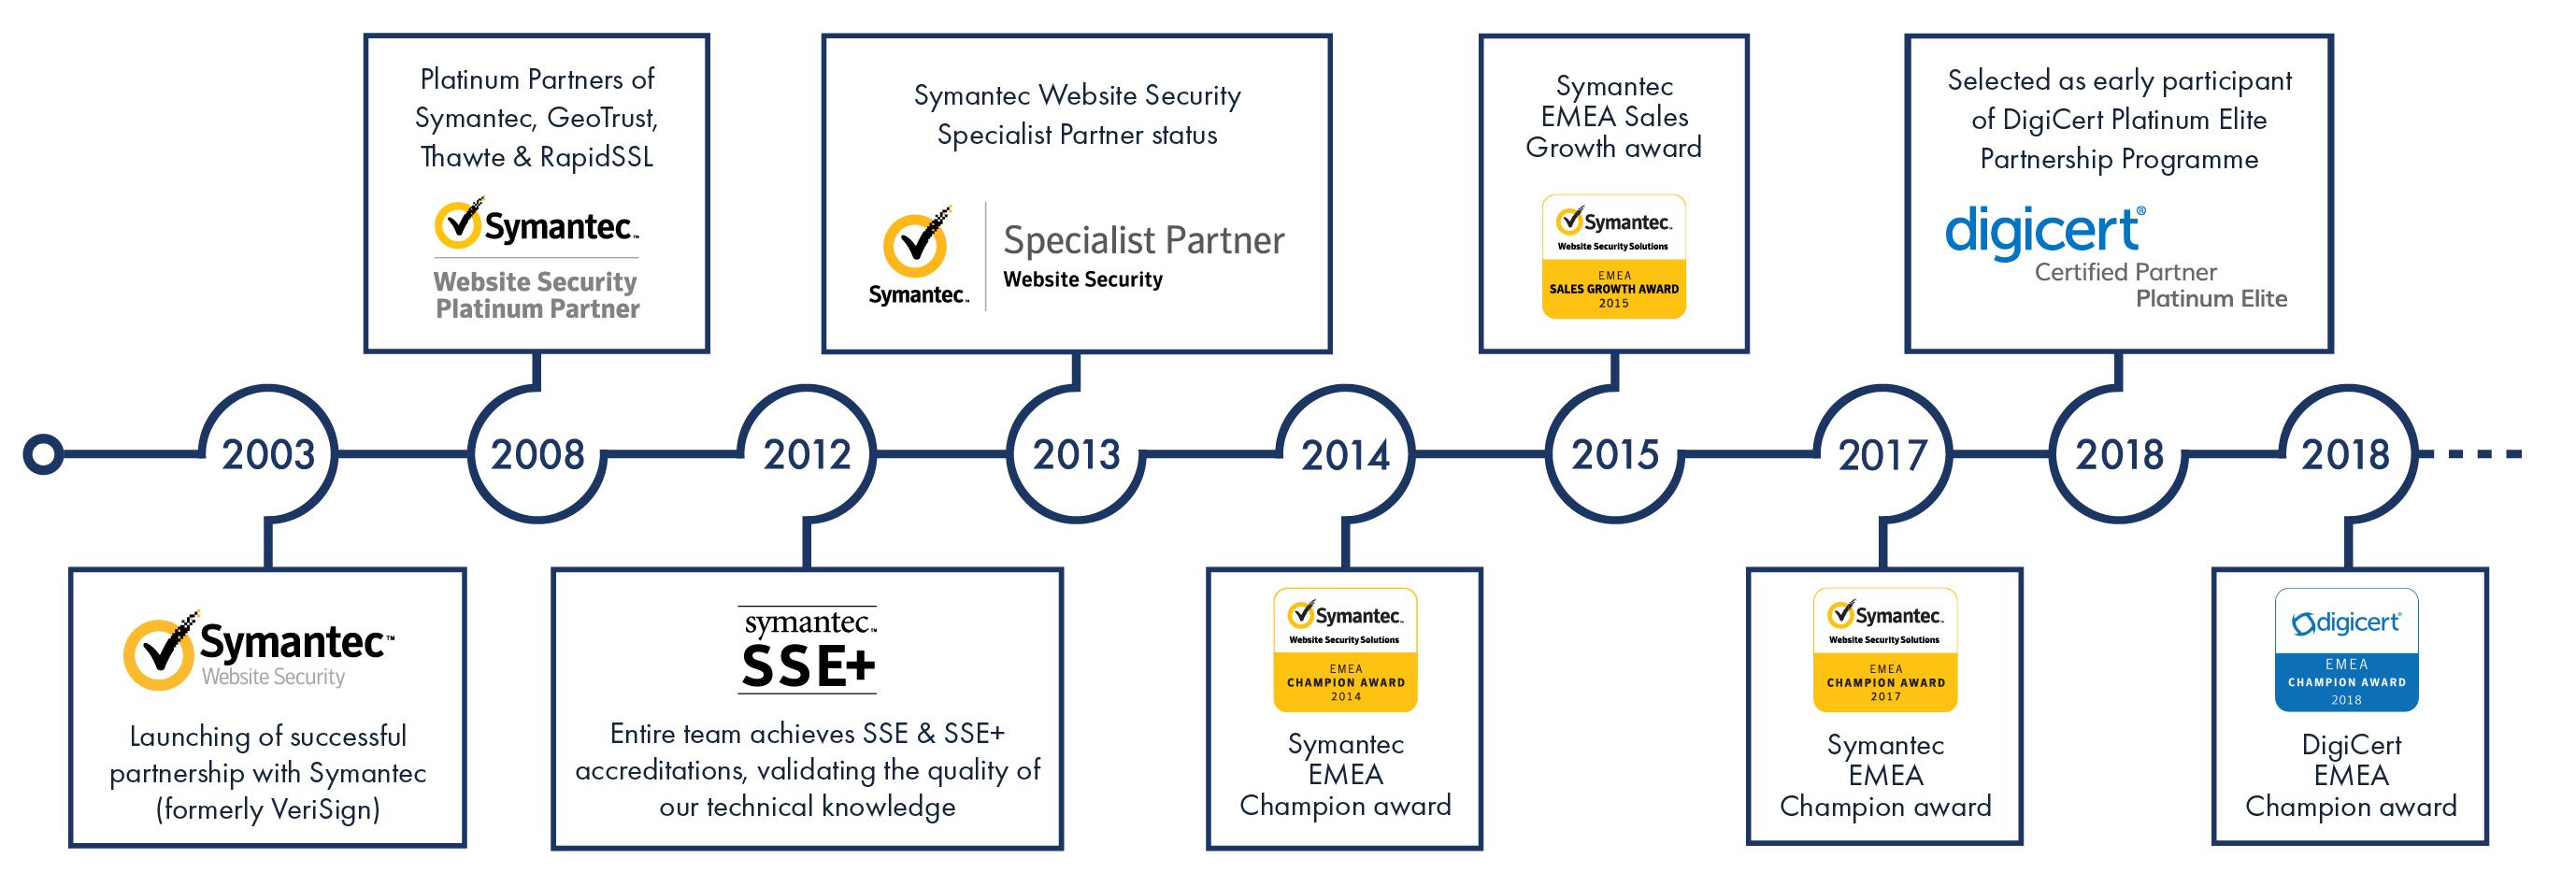 SSL247® - DigiCert Platinum Elite Partners and EMEA Champions